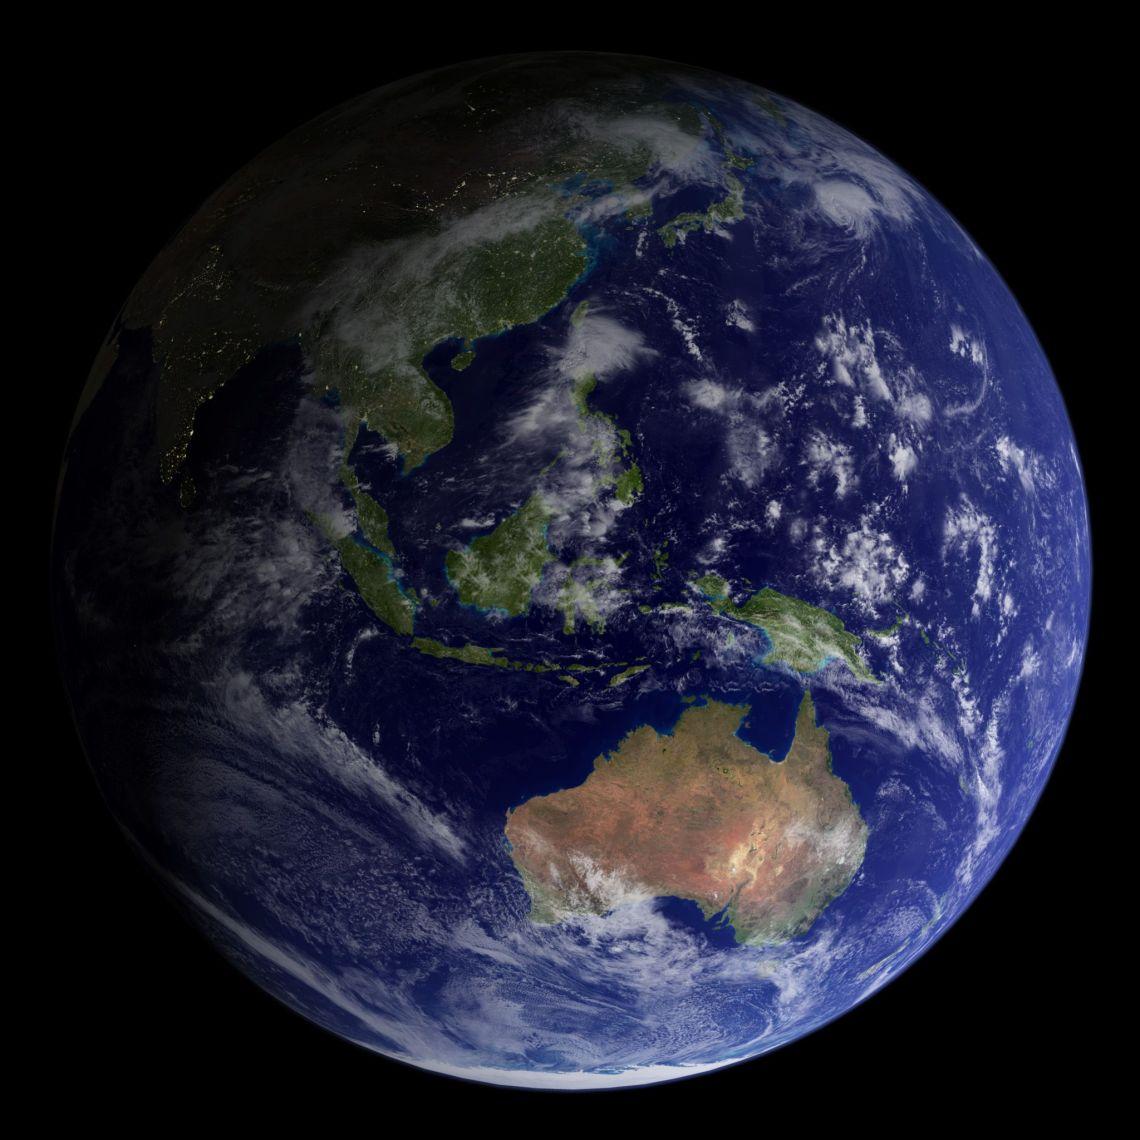 earth3au Apple Iphone Wallpaper Original